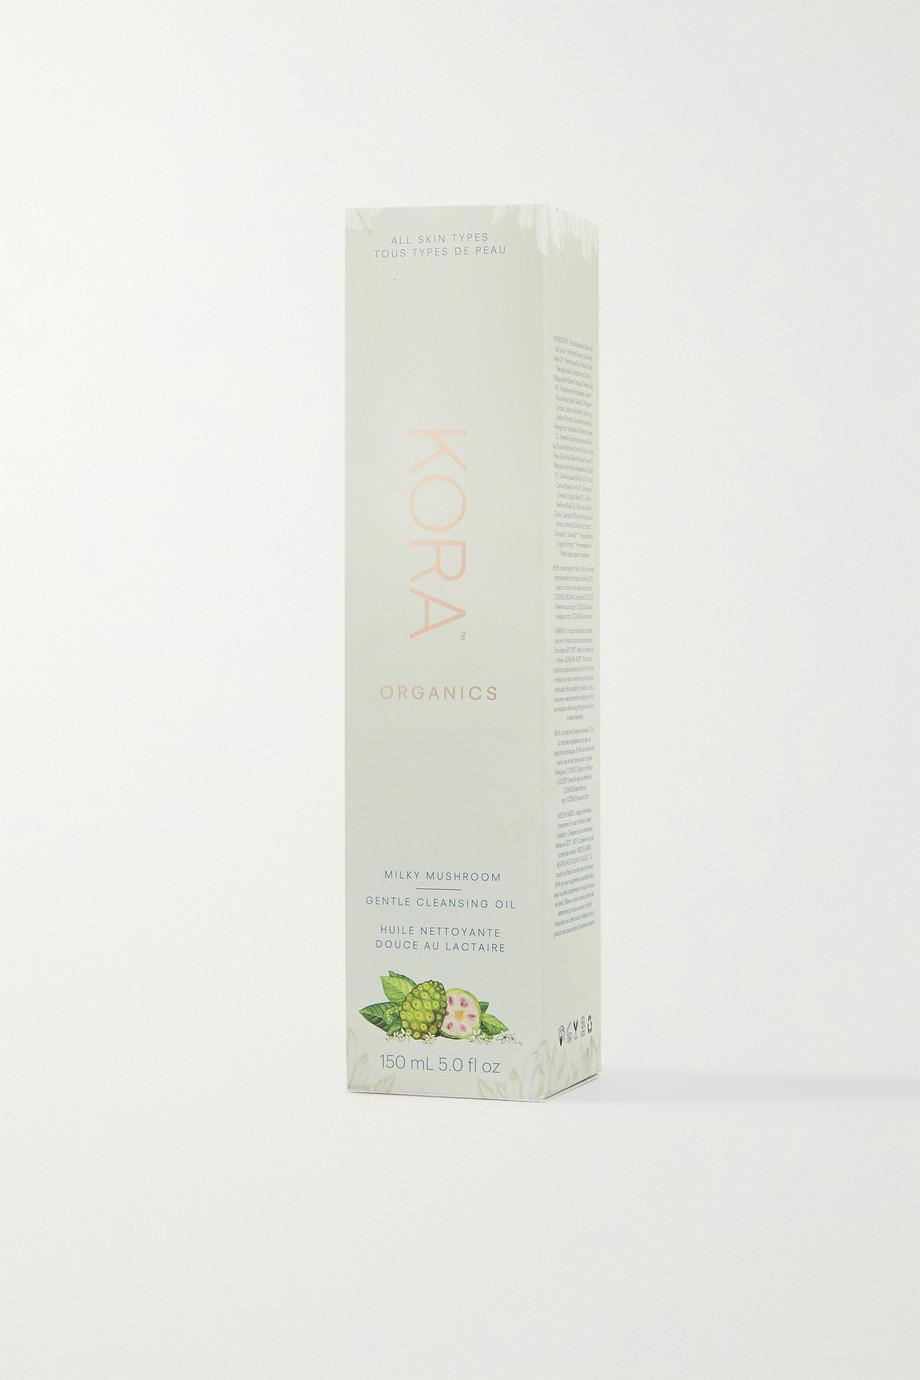 KORA Organics Milky Mushroom Gentle Cleansing Oil, 150ml